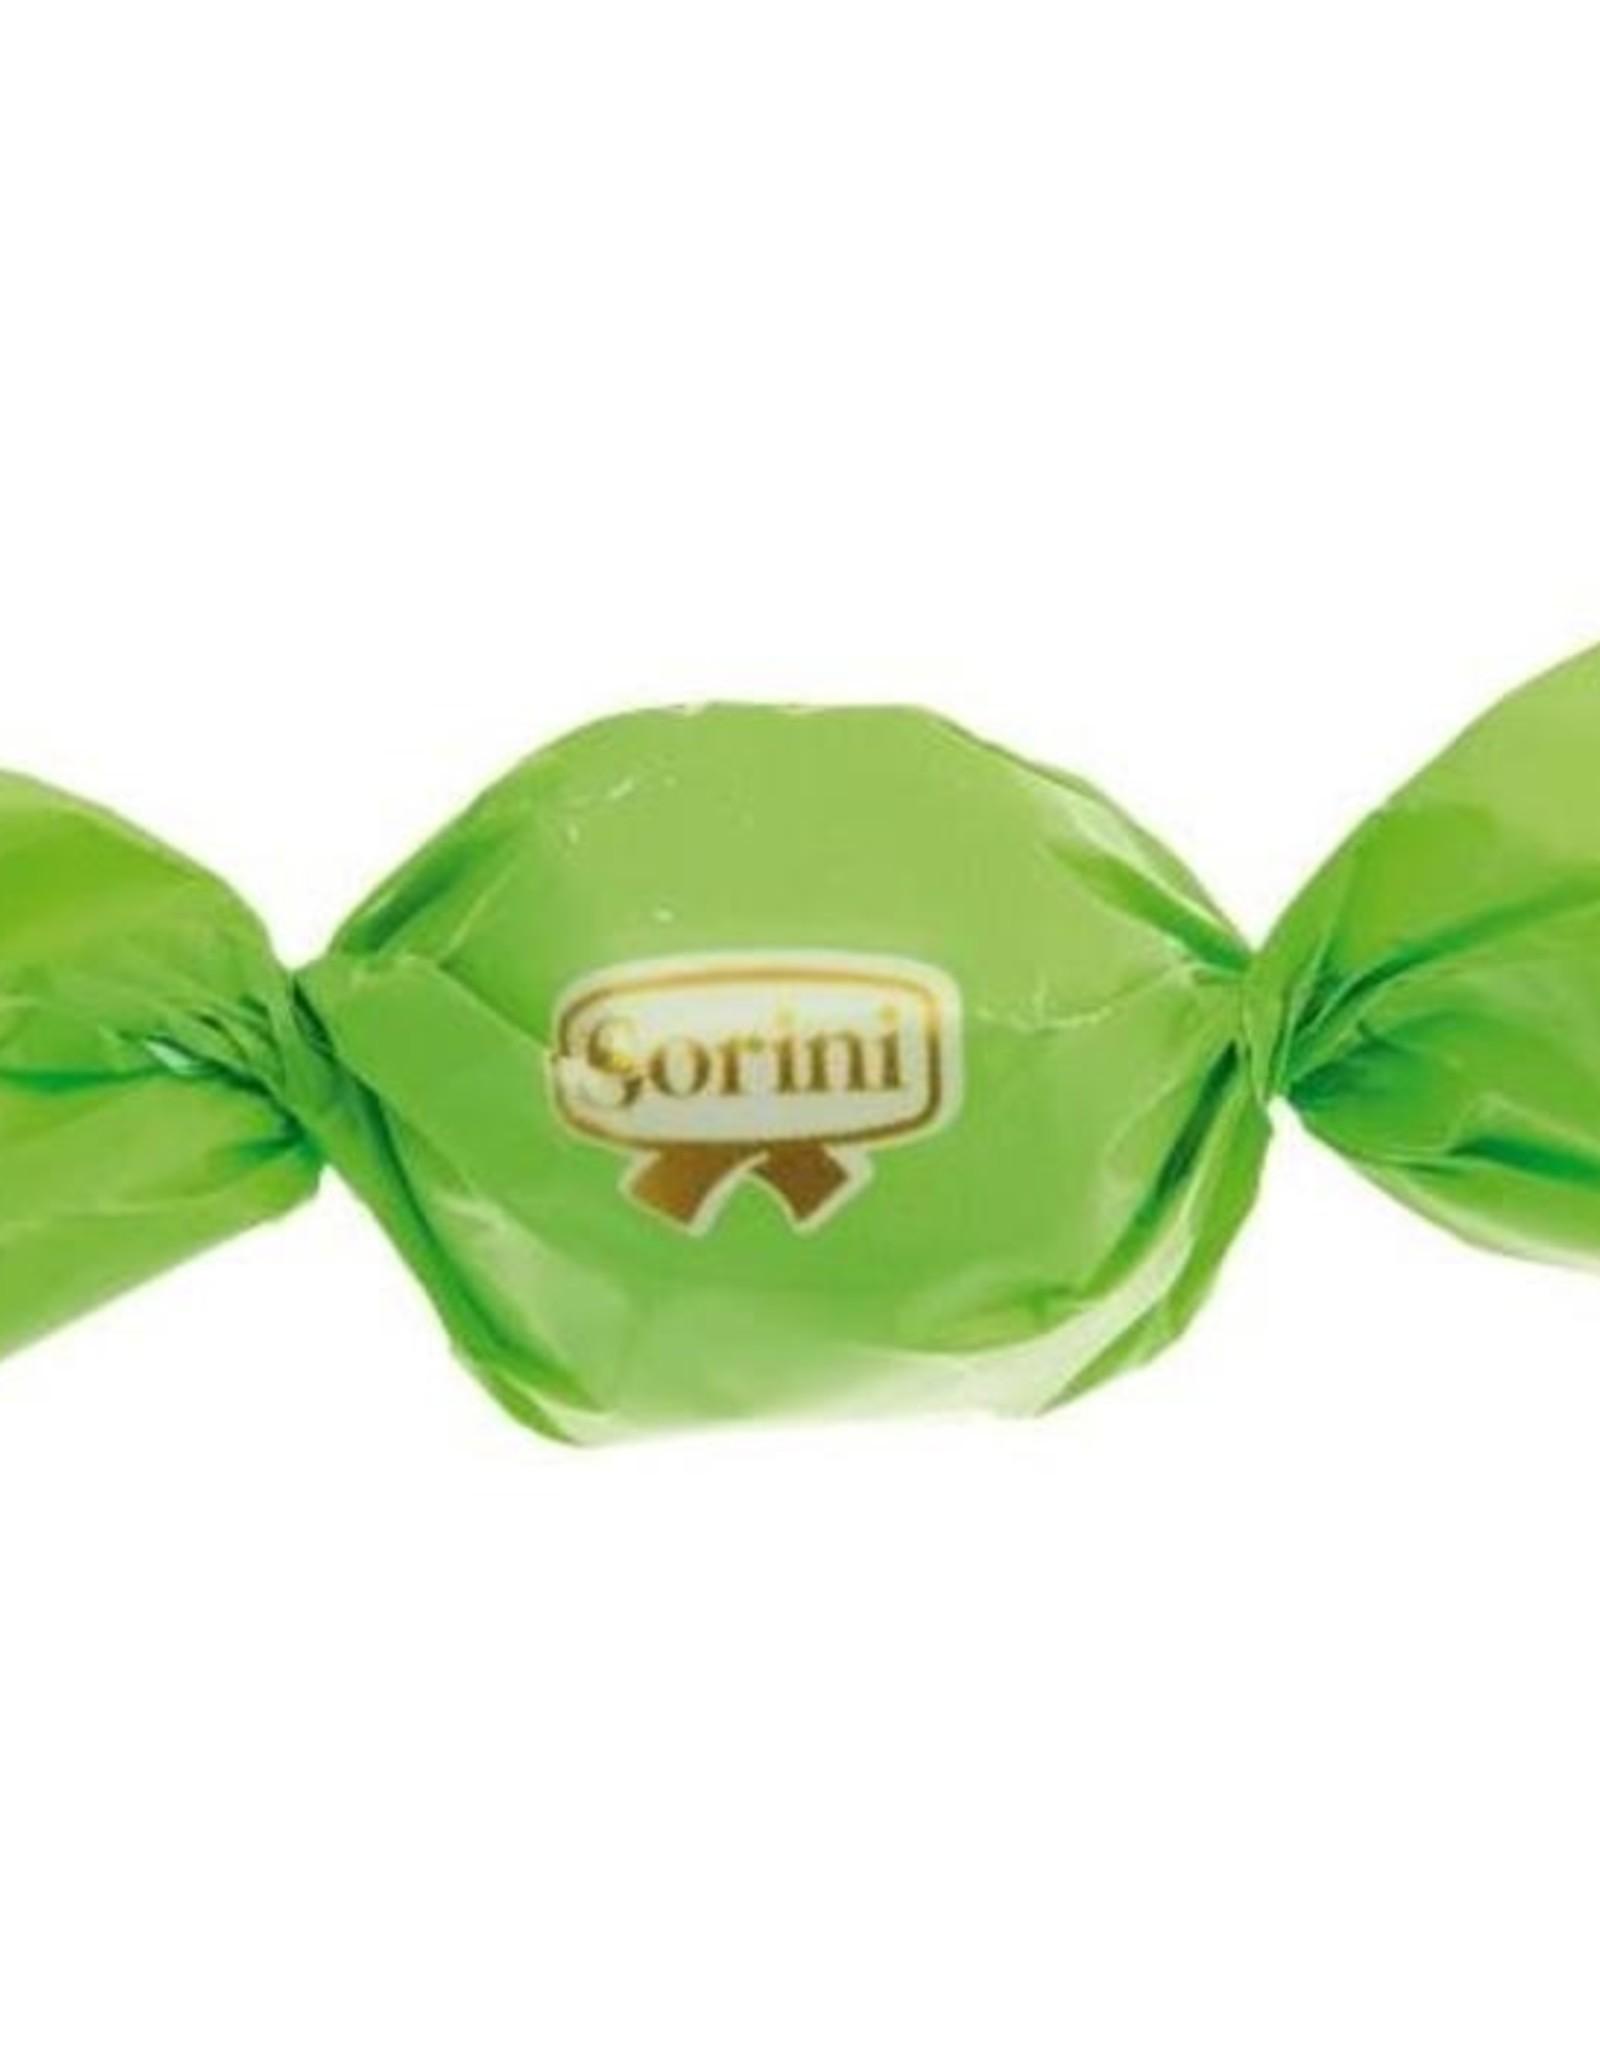 Chocoladebonbon Sorini groen